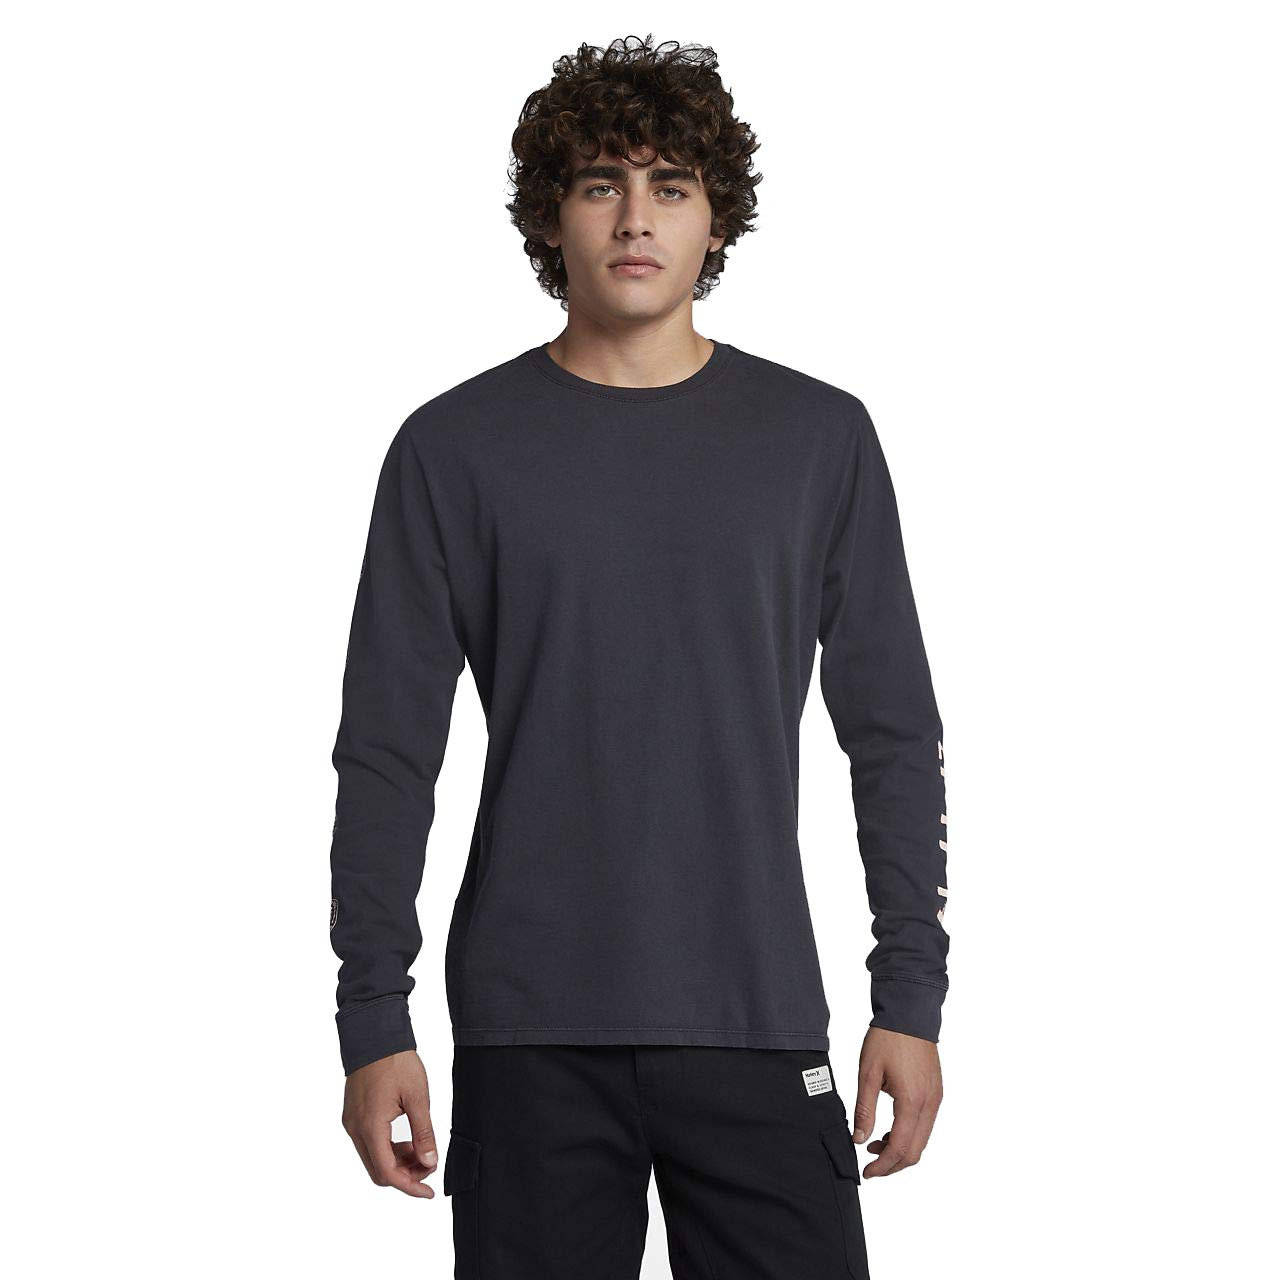 Hurley AJ1749 Men's Heavy Cool Summer Long Sleeve T-Shirt, Anthracite - M